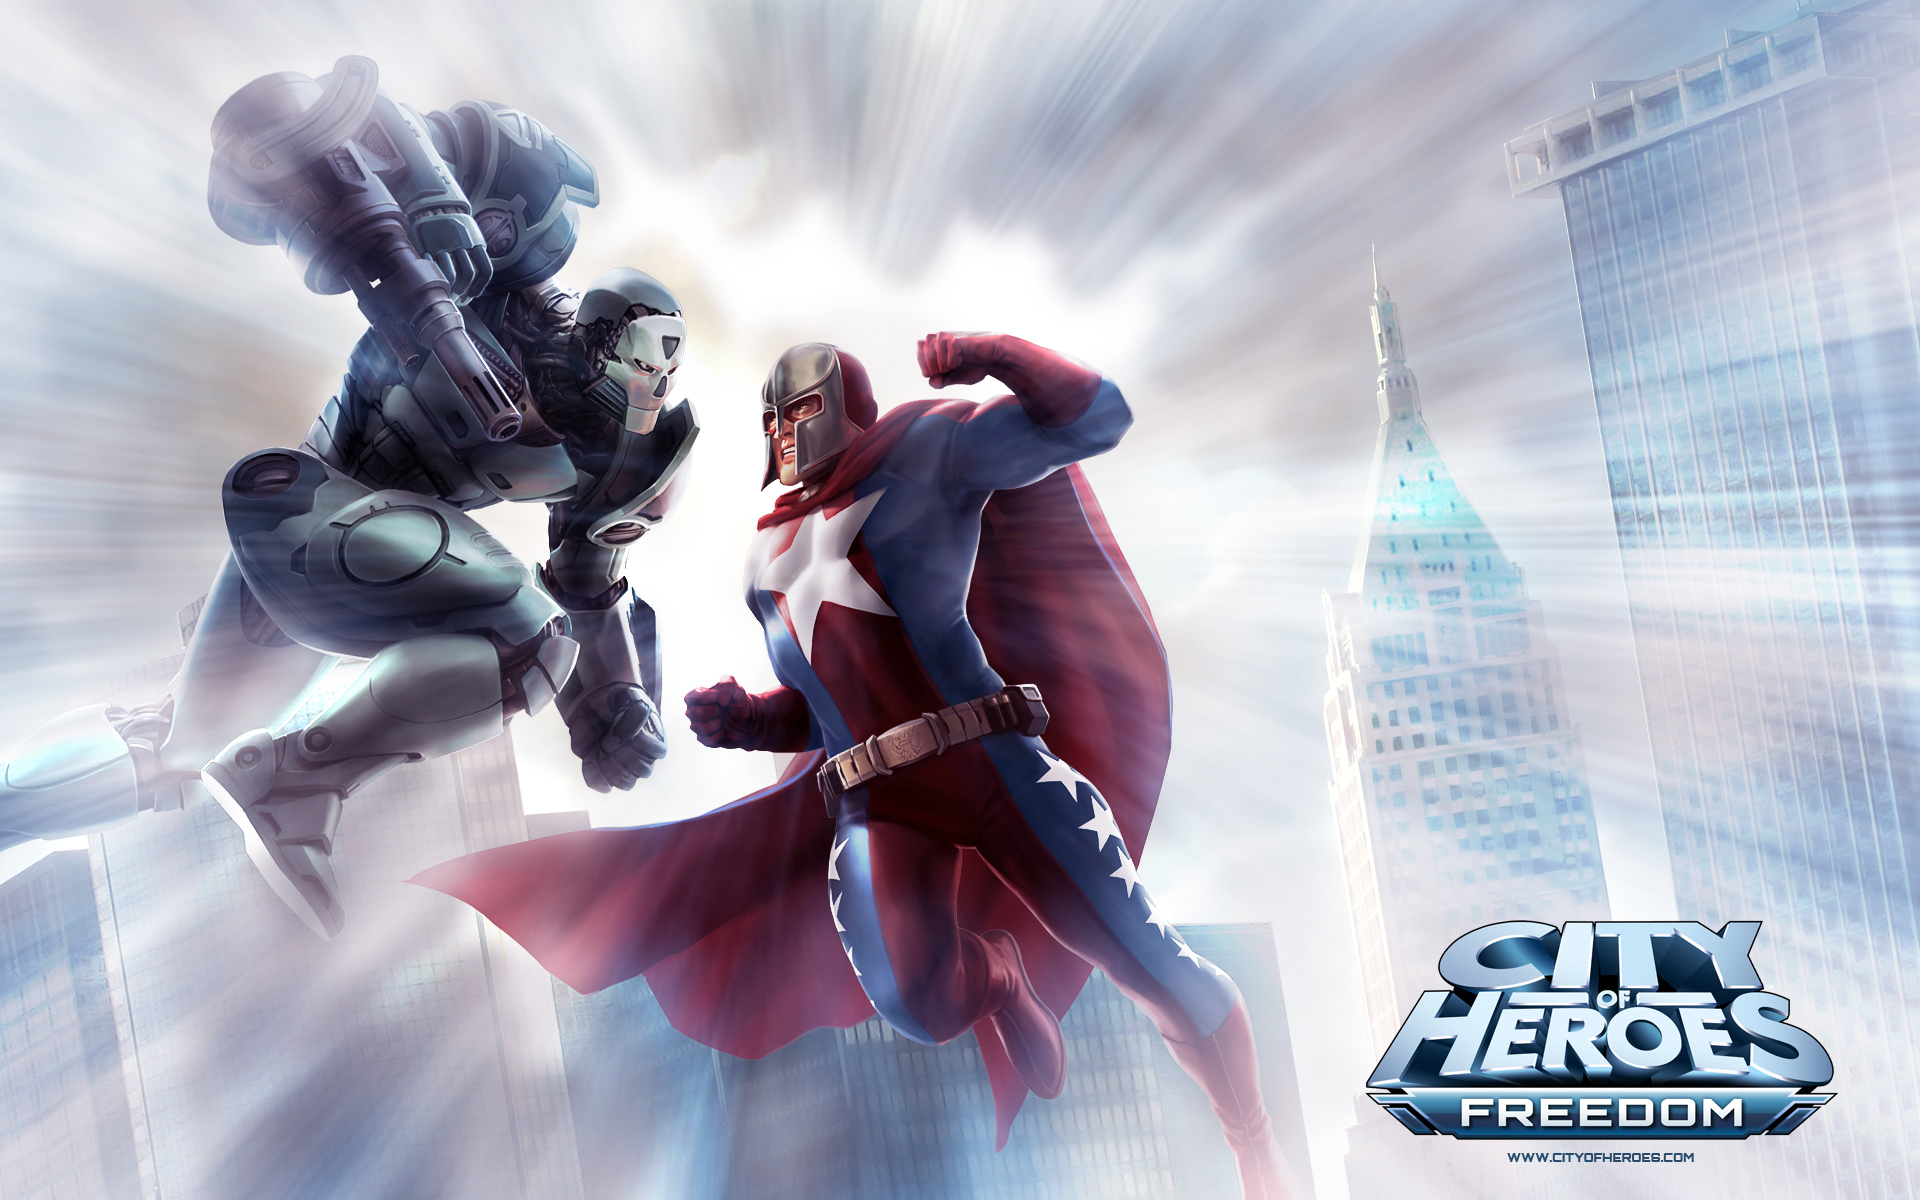 City of Heroes wallpaper 8